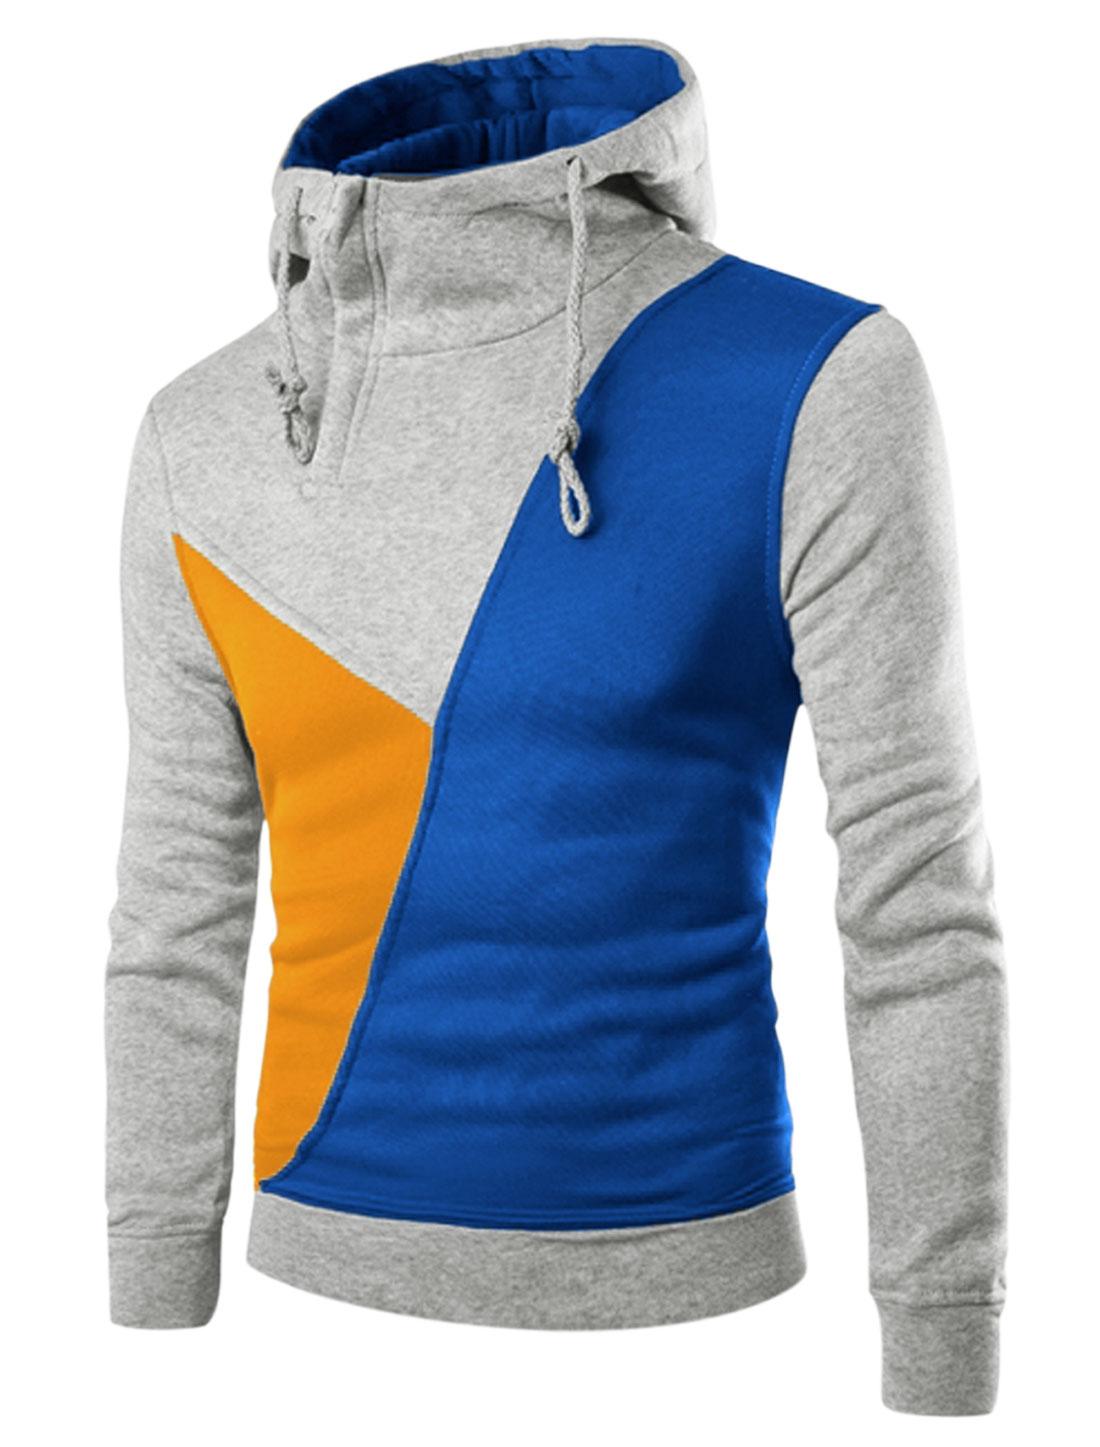 Men Color Block Inclined Zip Upper Casual Drawstring Hoodie Blue Light Gray M